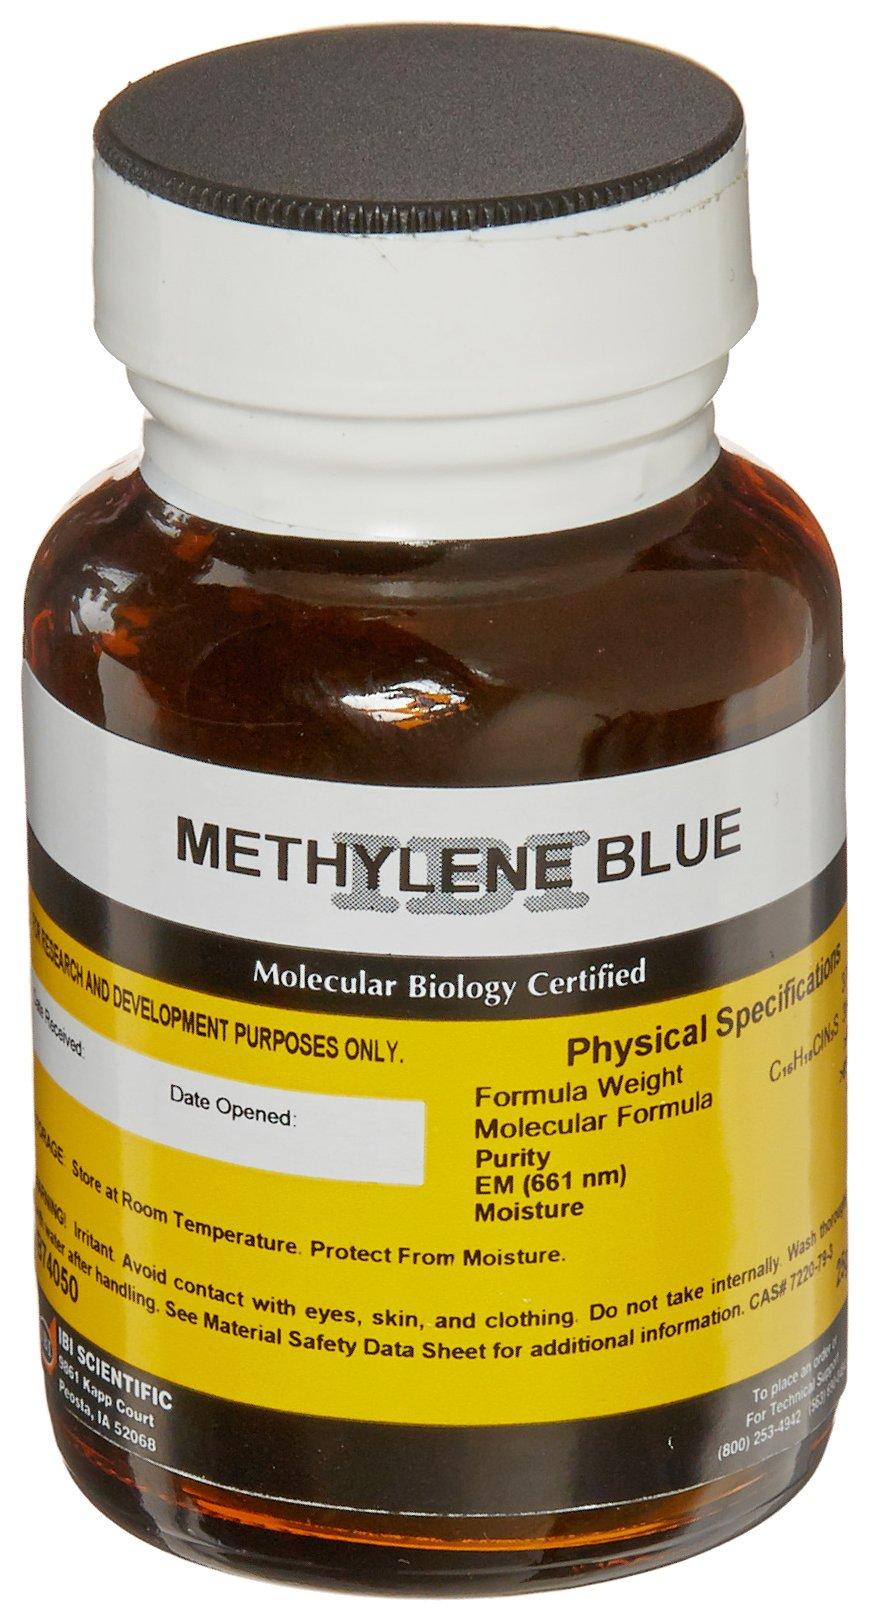 IBI Scientific IB74050 Methylene Blue Stain, 25gm